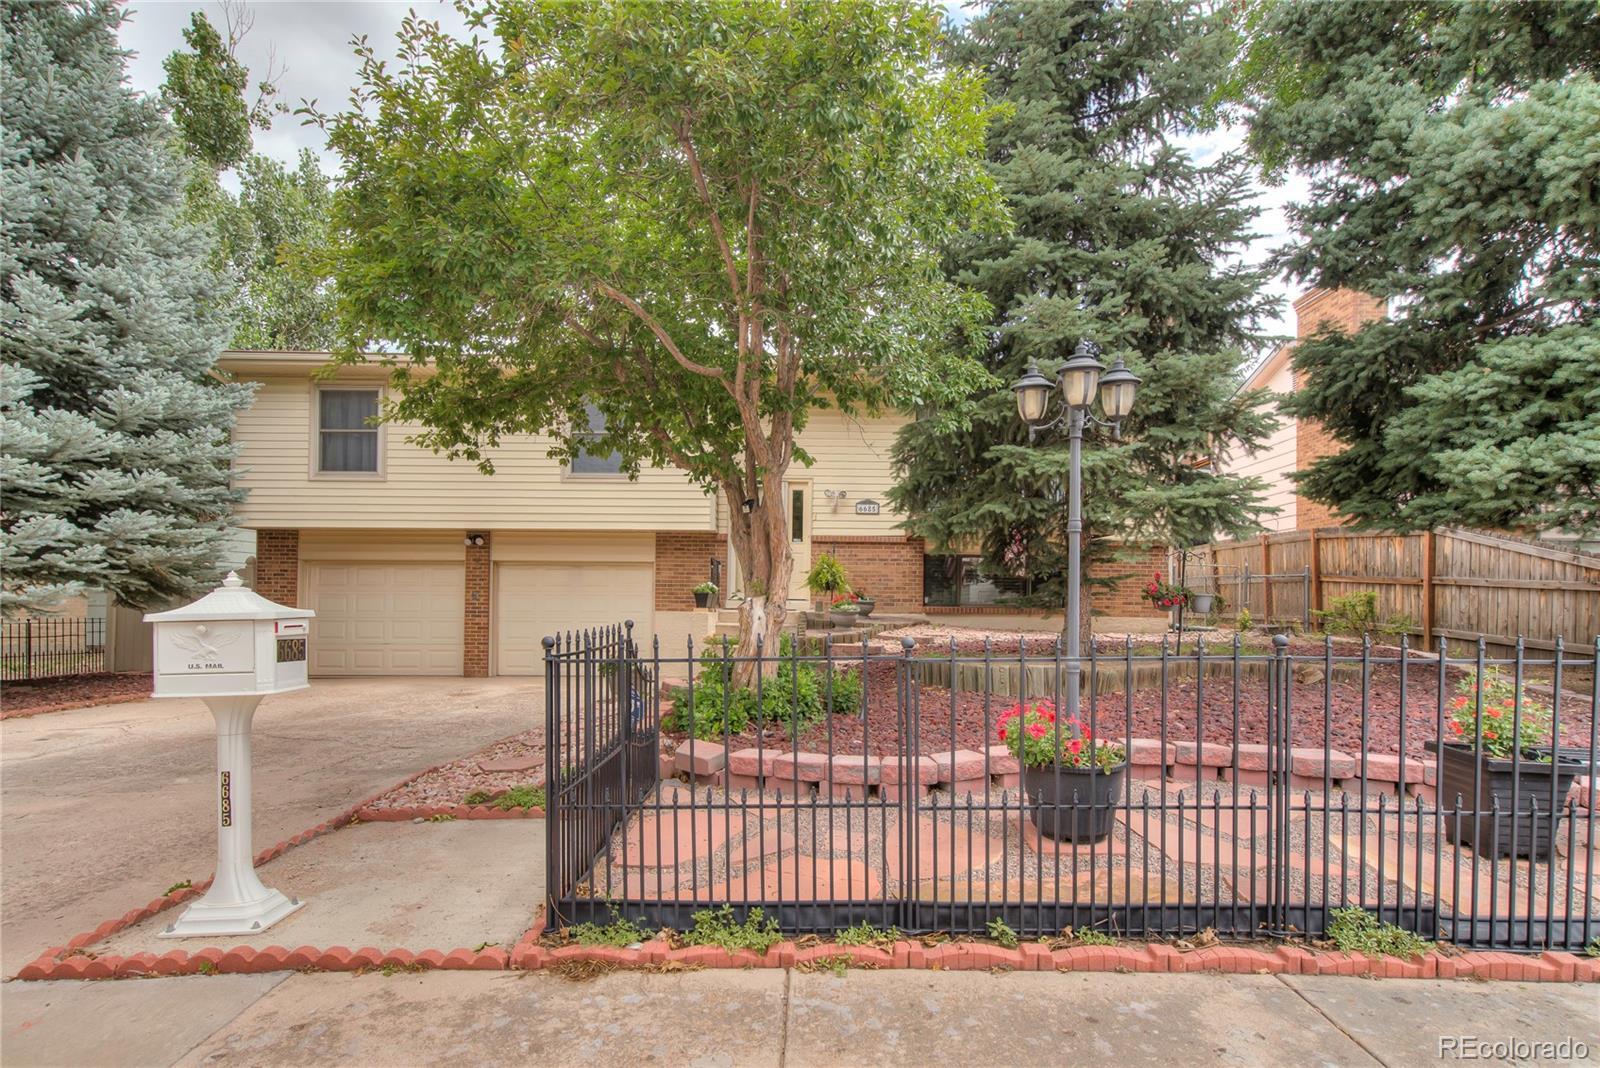 MLS# 2141630 - 35 - 6685 Brook Park Drive, Colorado Springs, CO 80918